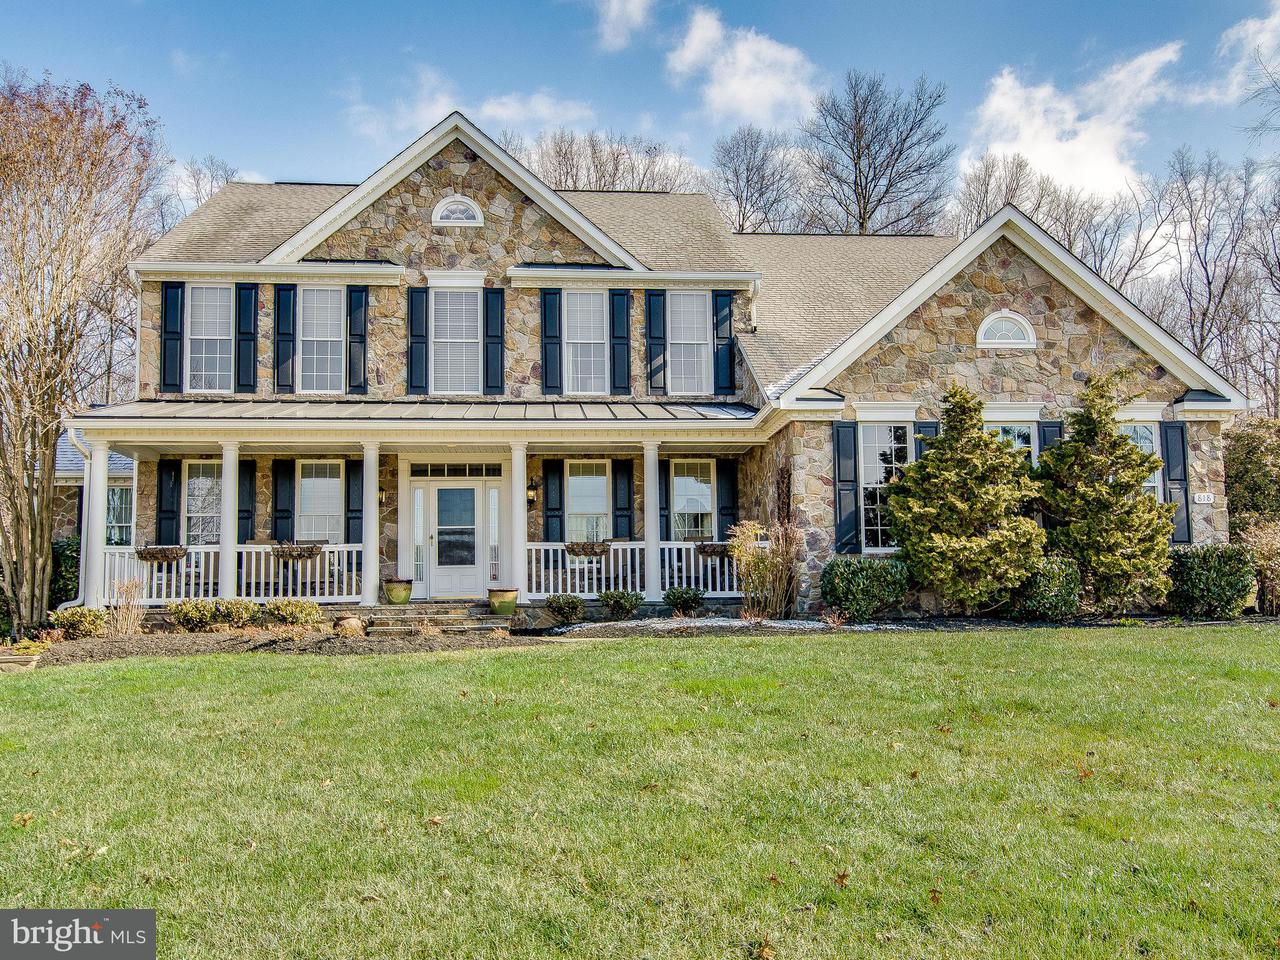 獨棟家庭住宅 為 出售 在 818 Avonshire Court 818 Avonshire Court Eldersburg, 馬里蘭州 21784 美國